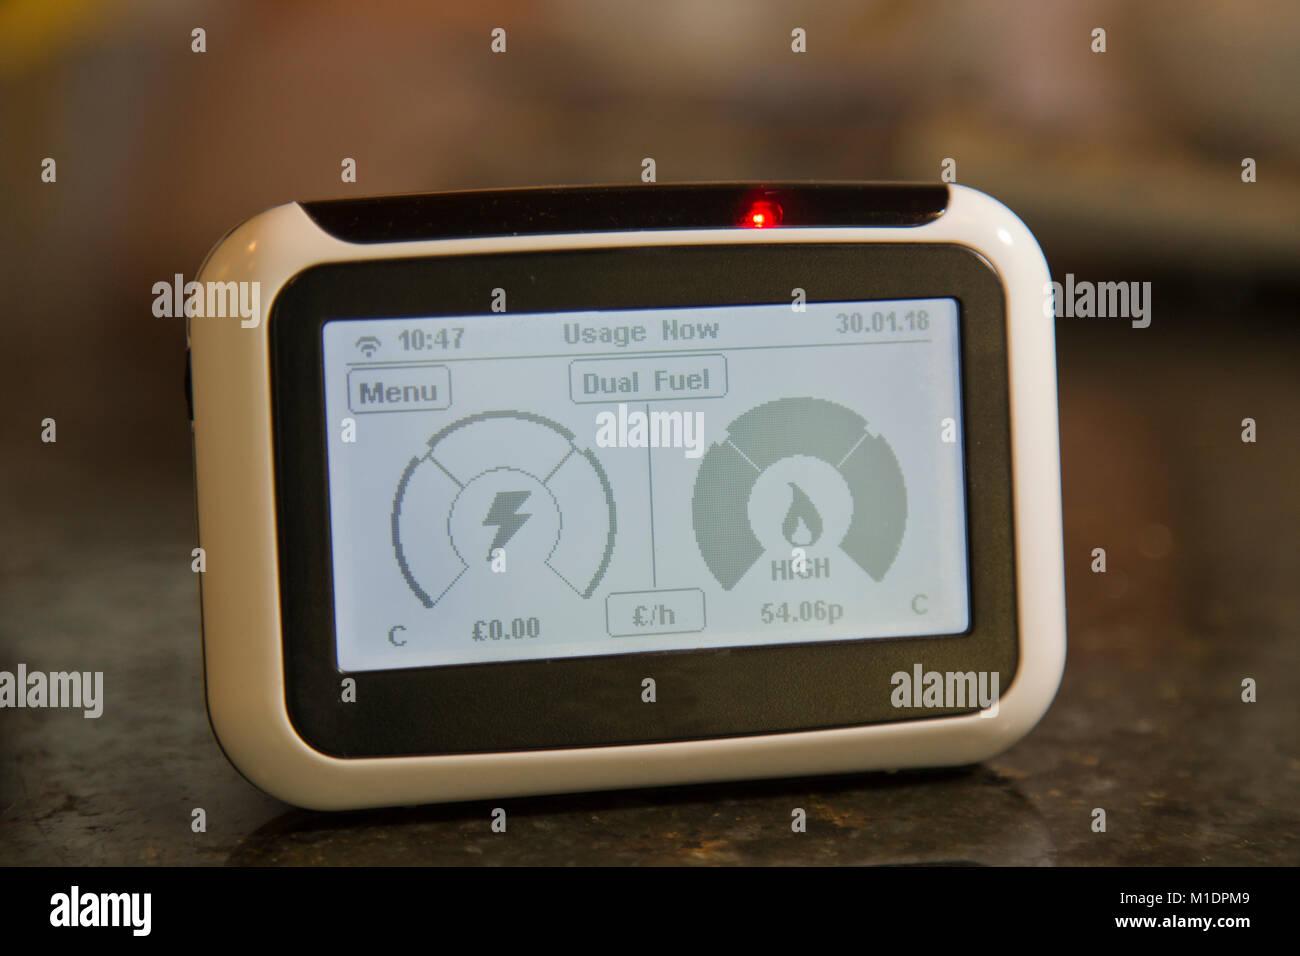 Smart Meter monitor - Stock Image